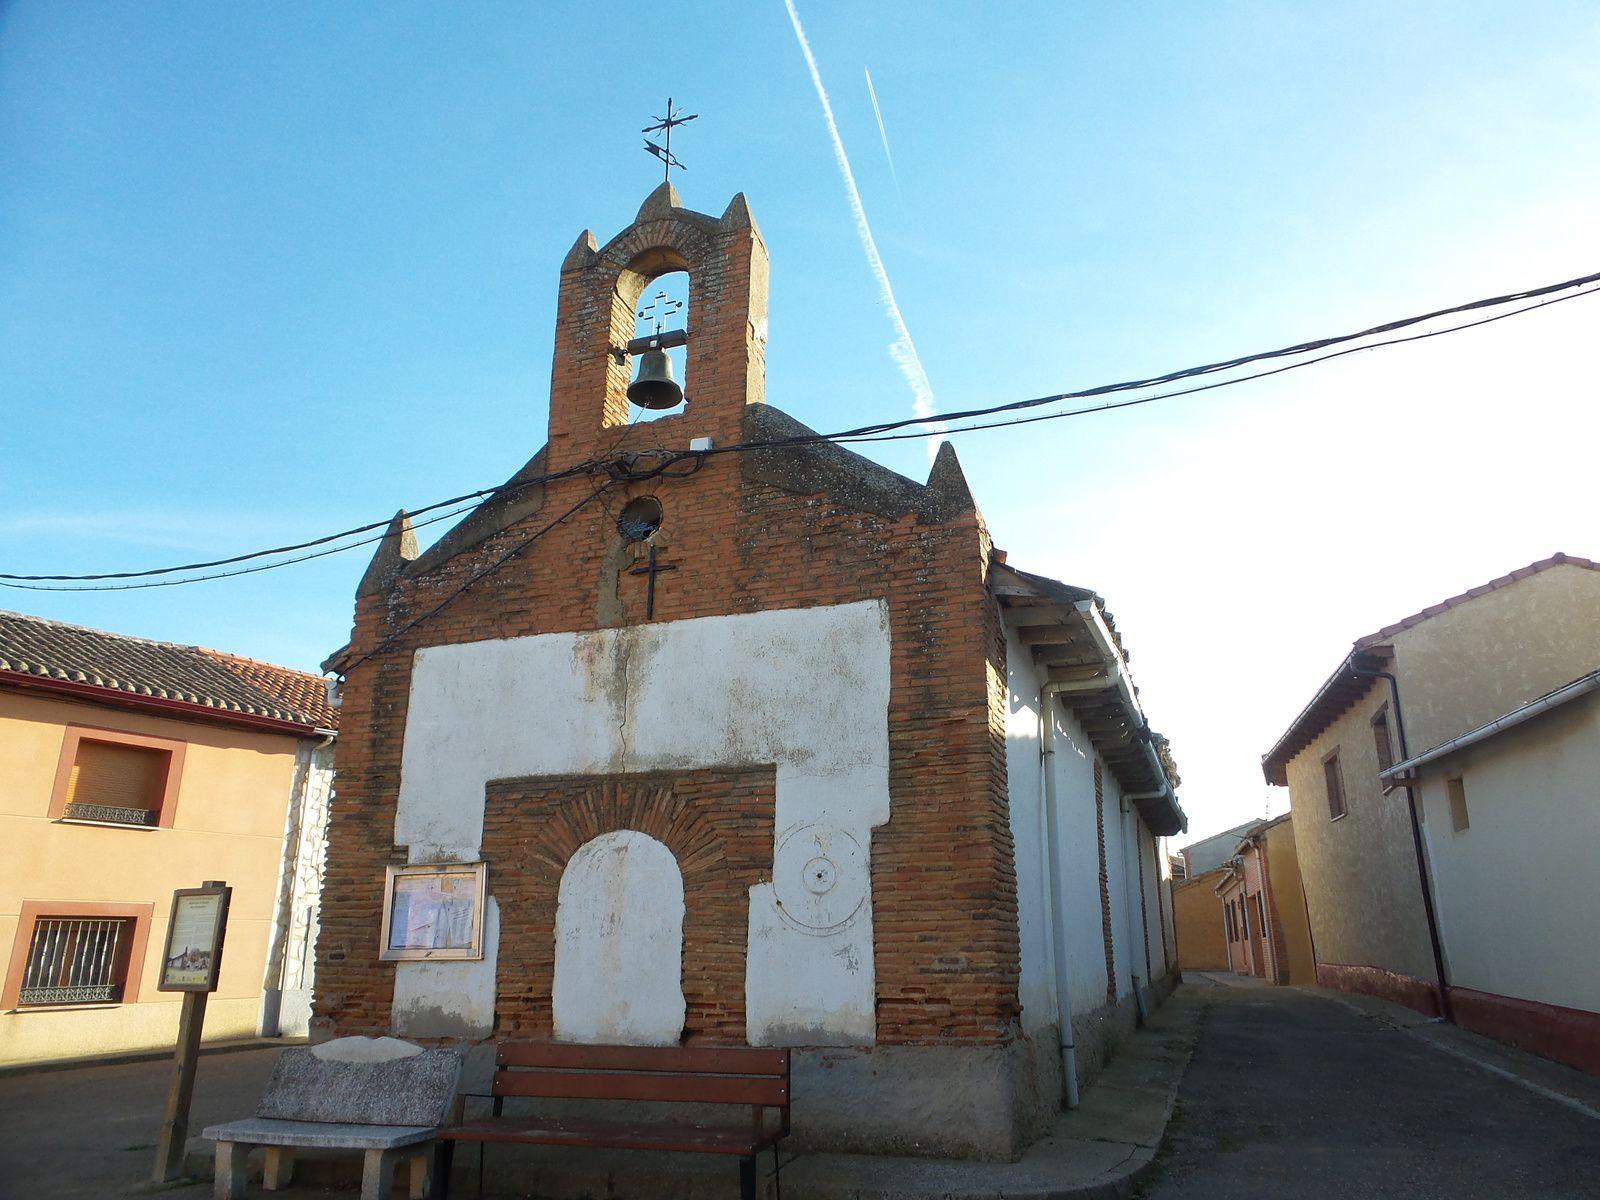 Calzadilla de los Hermanillos, Albergue Via Trajana, Dessert flan maison